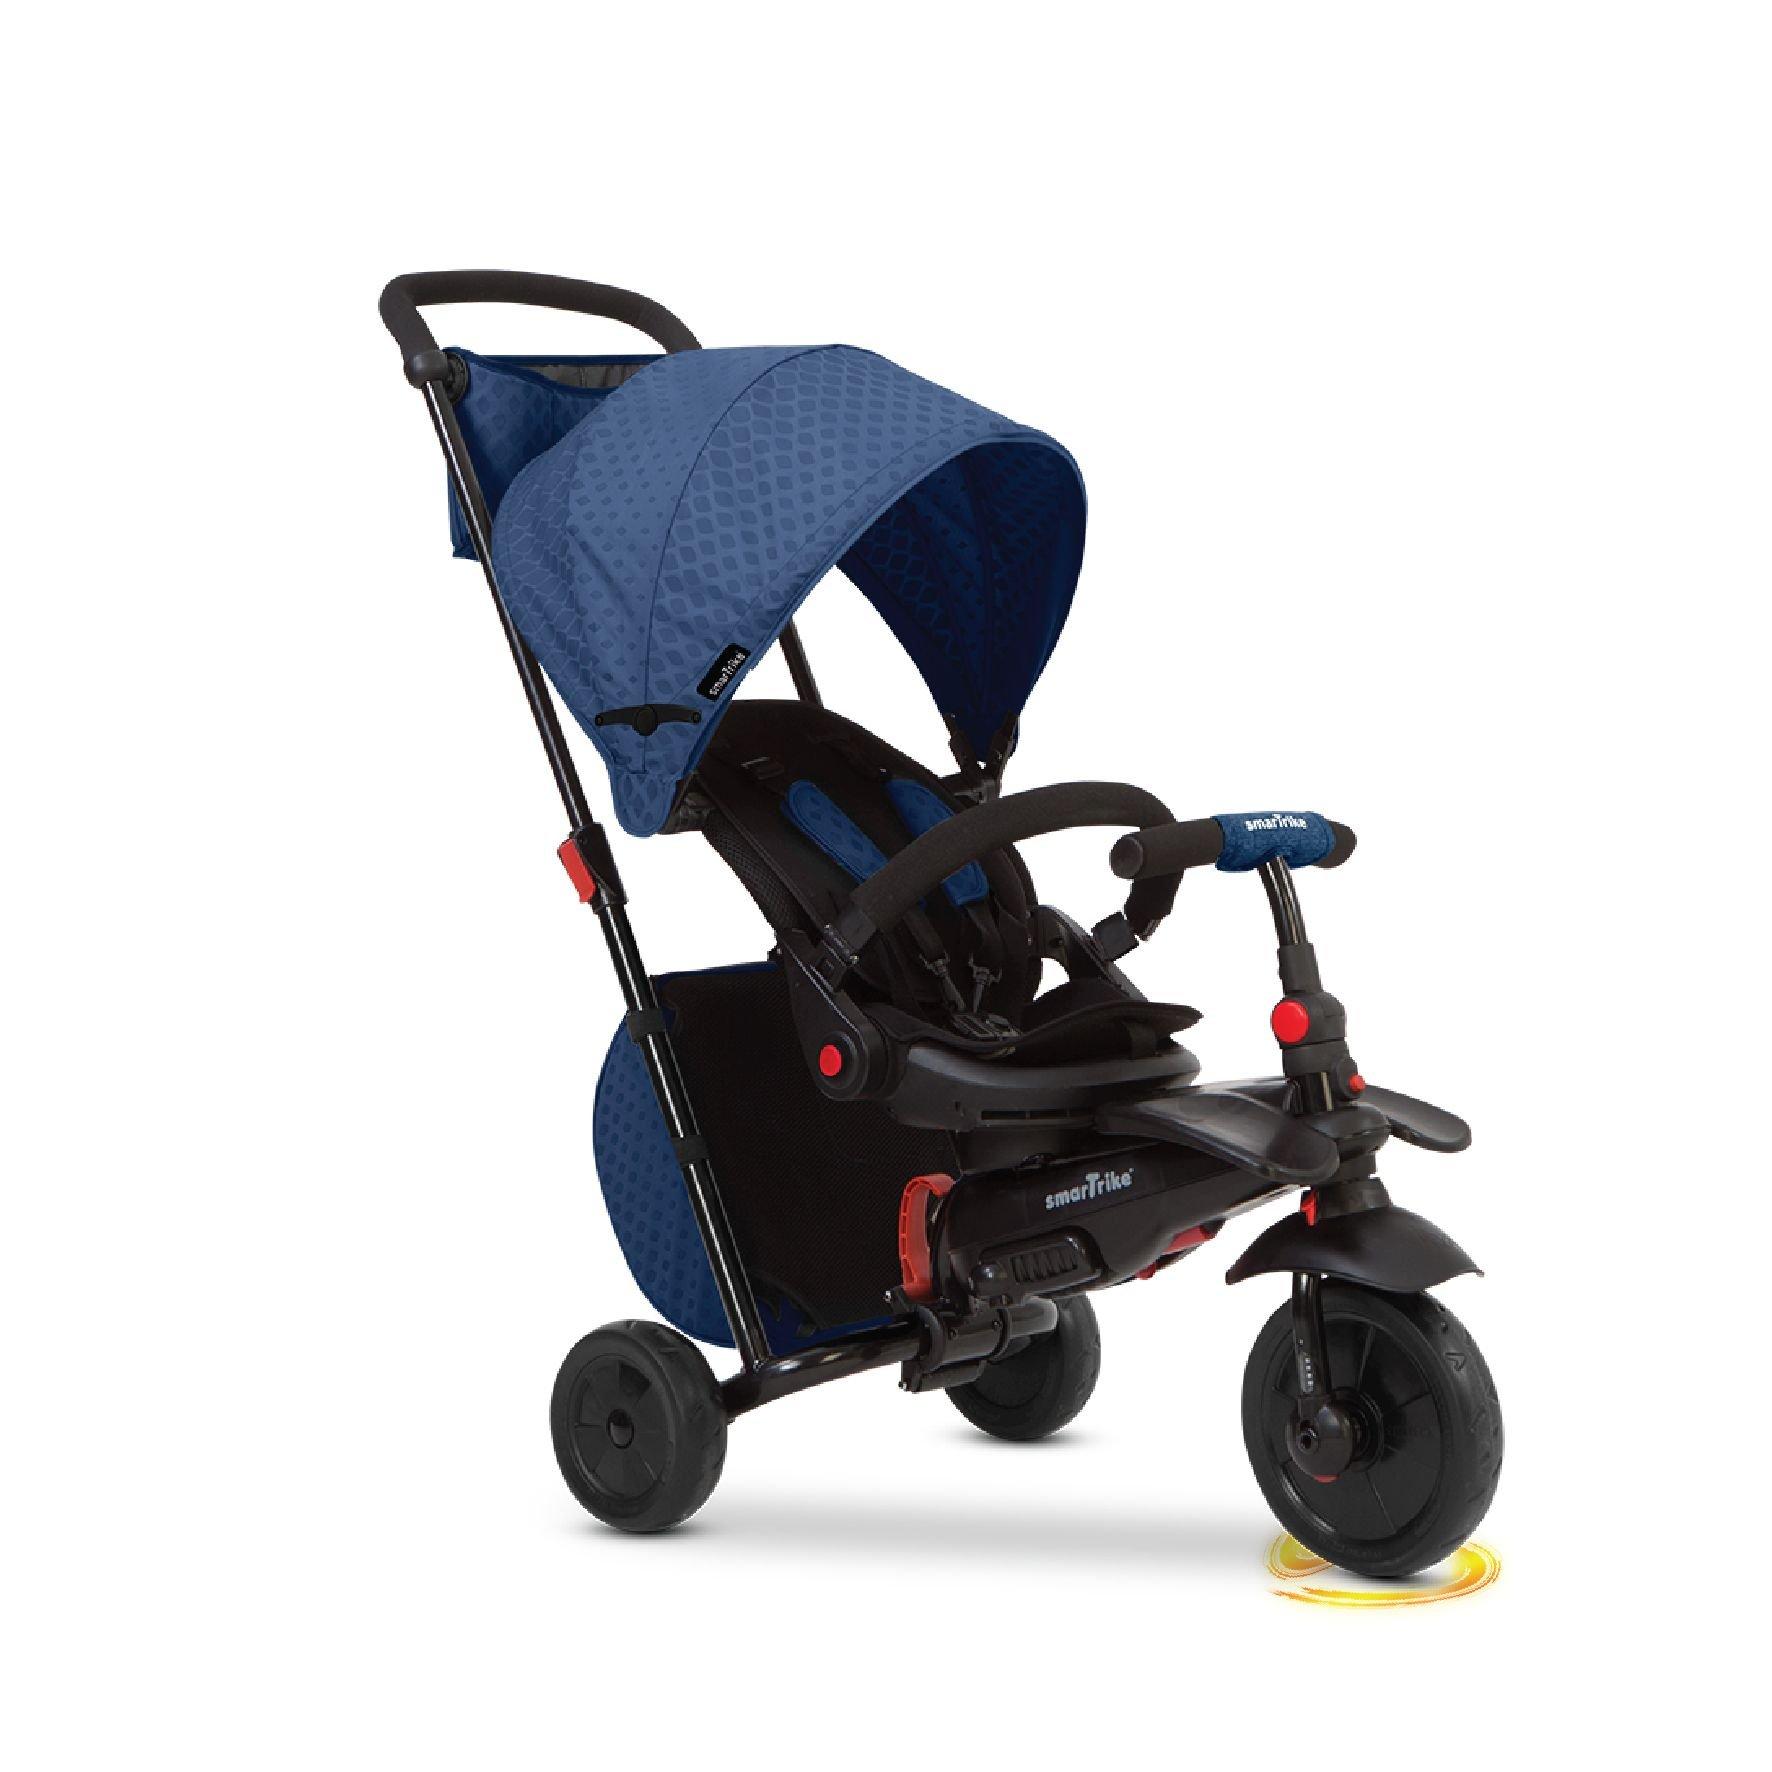 smarTrike Foldable Tricycle smarTfold 700 2019 blau - Buy at kidsroom   Toys